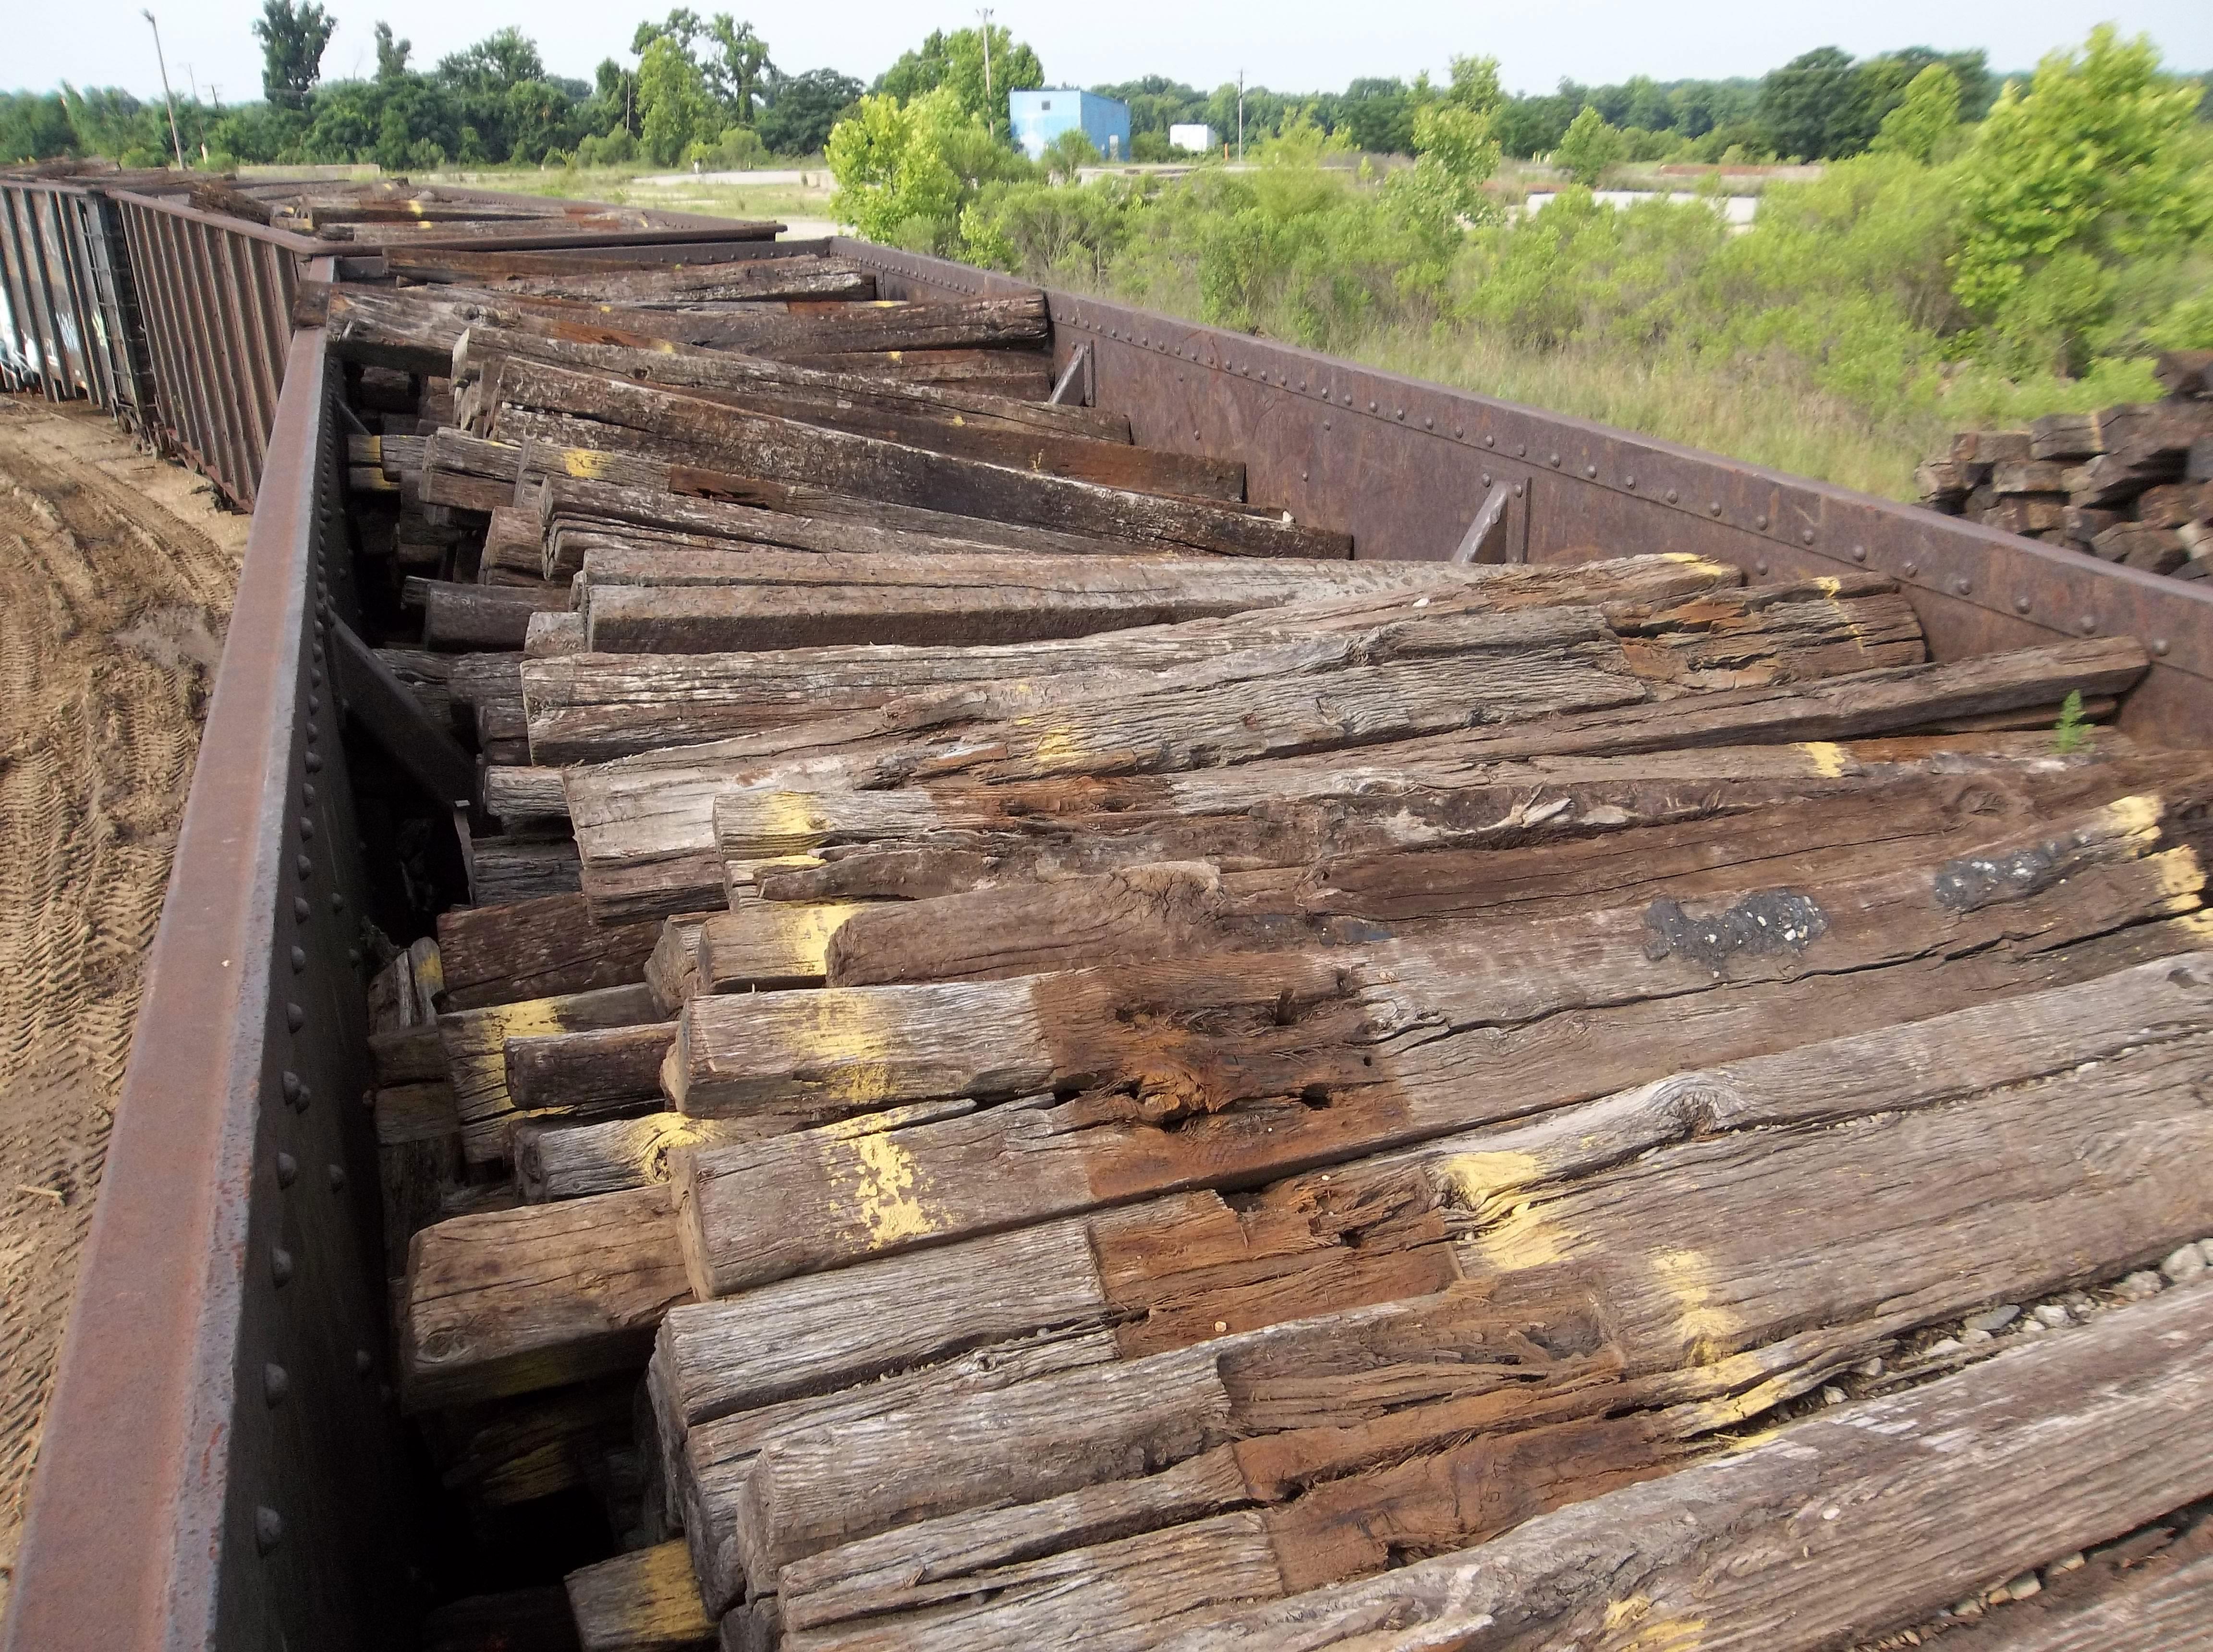 railroad tie disposal photo - 1